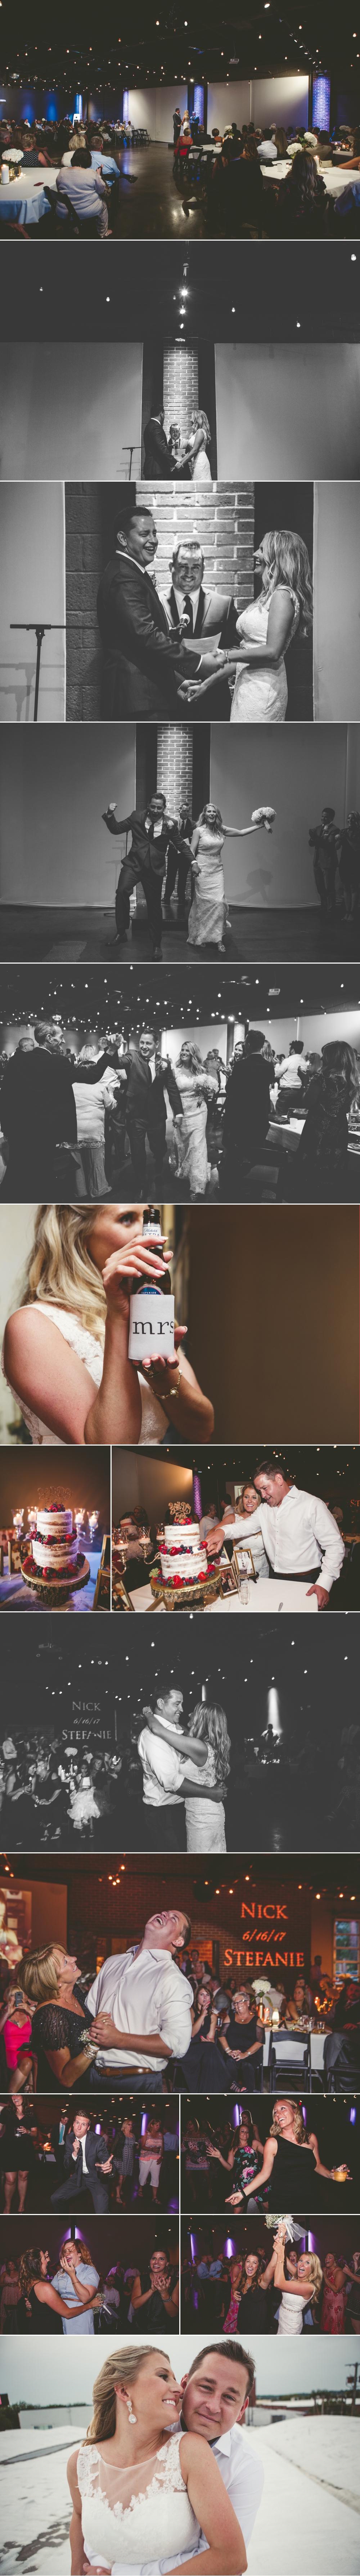 jason_domingues_photography_best_kansas_city_wedding_photographer_kc_weddings_black_on_burlington_0003.JPG